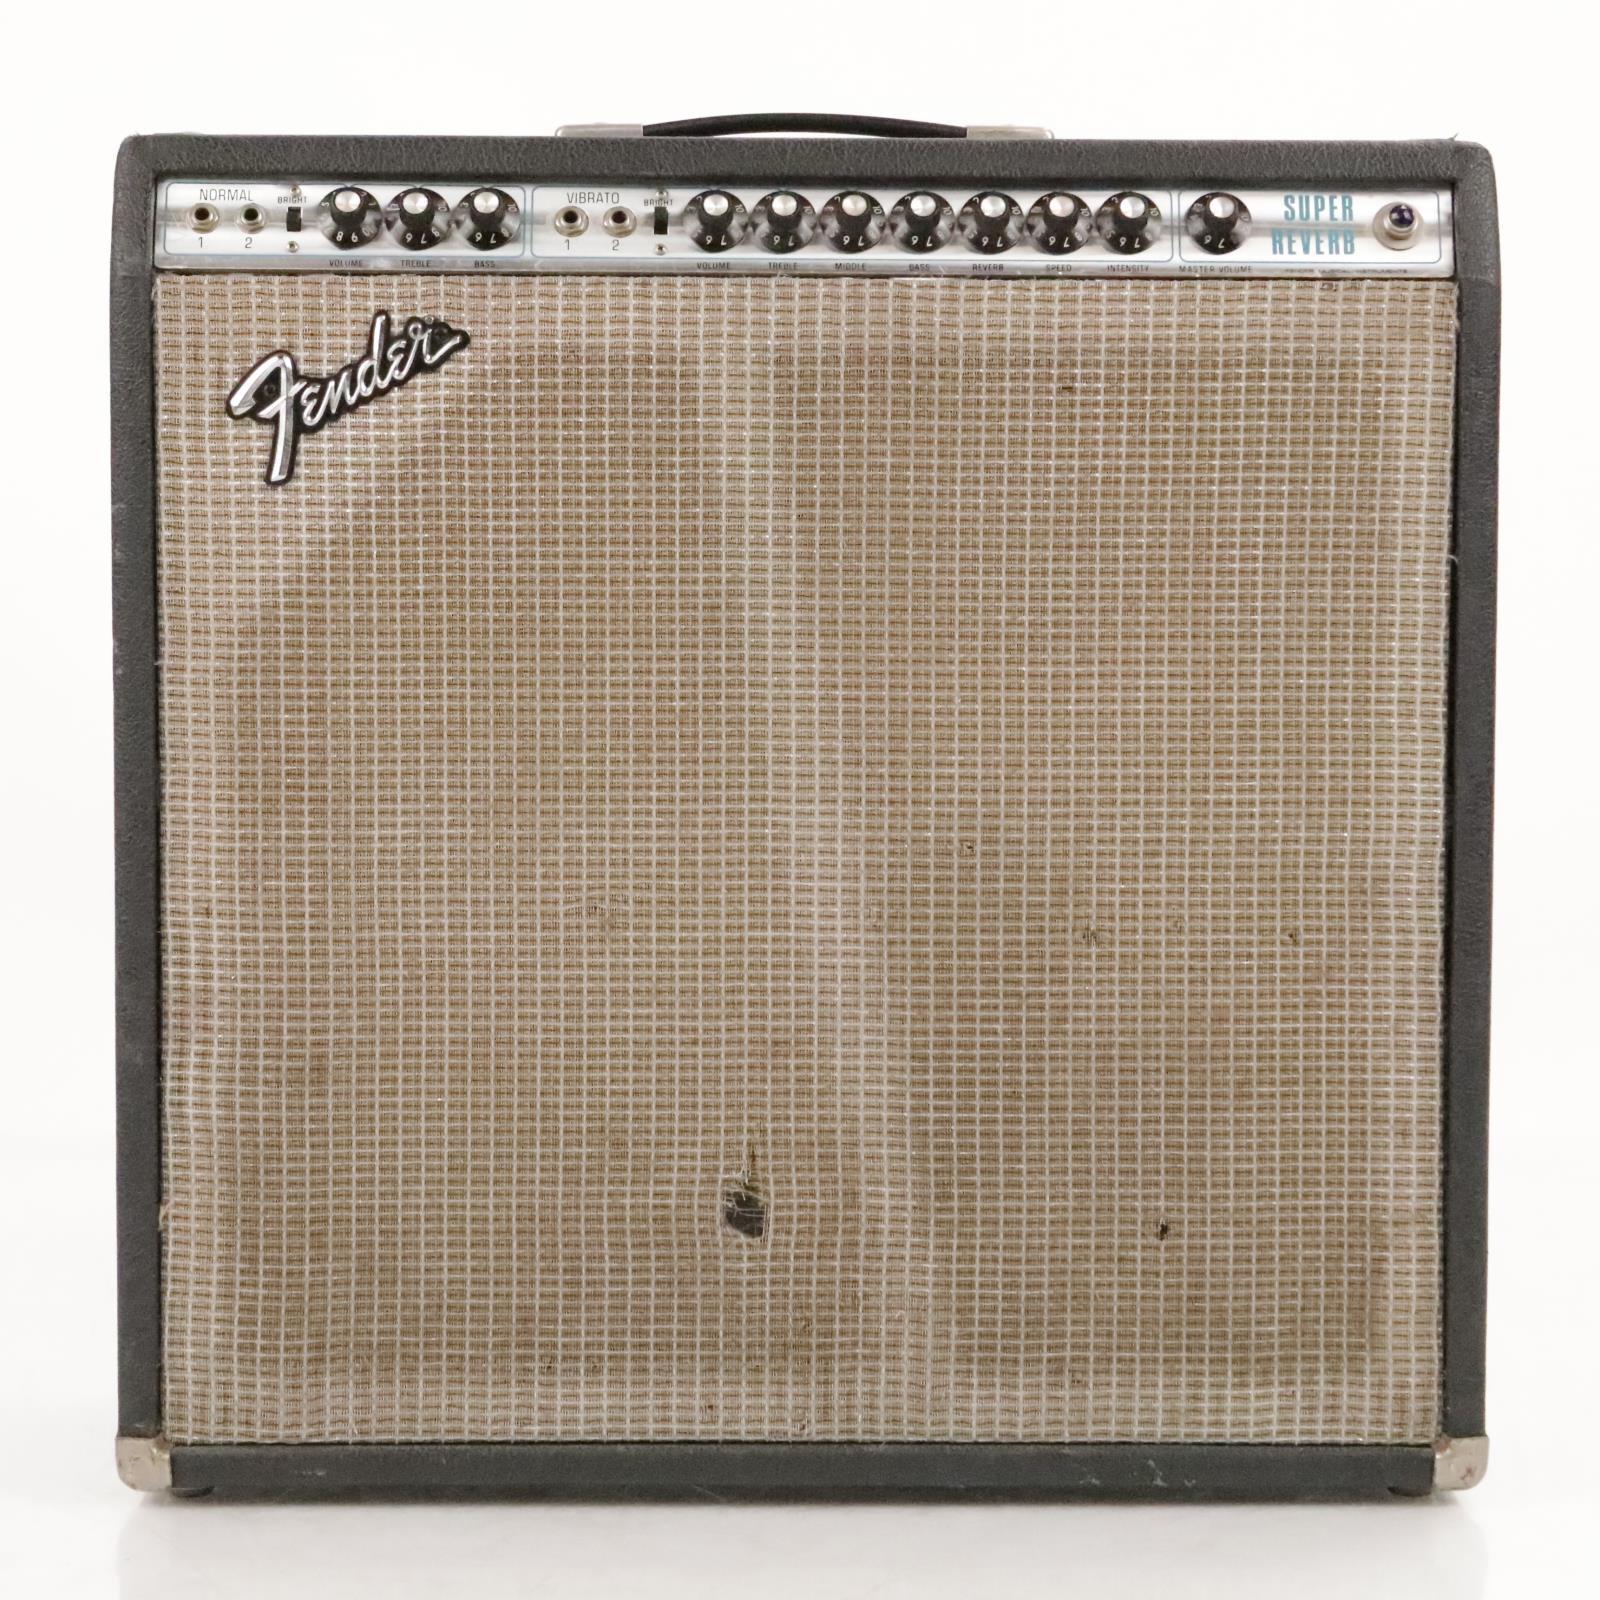 1975 Fender Super Reverb w/ 4 Fender CTS Alnico Speakers #36290